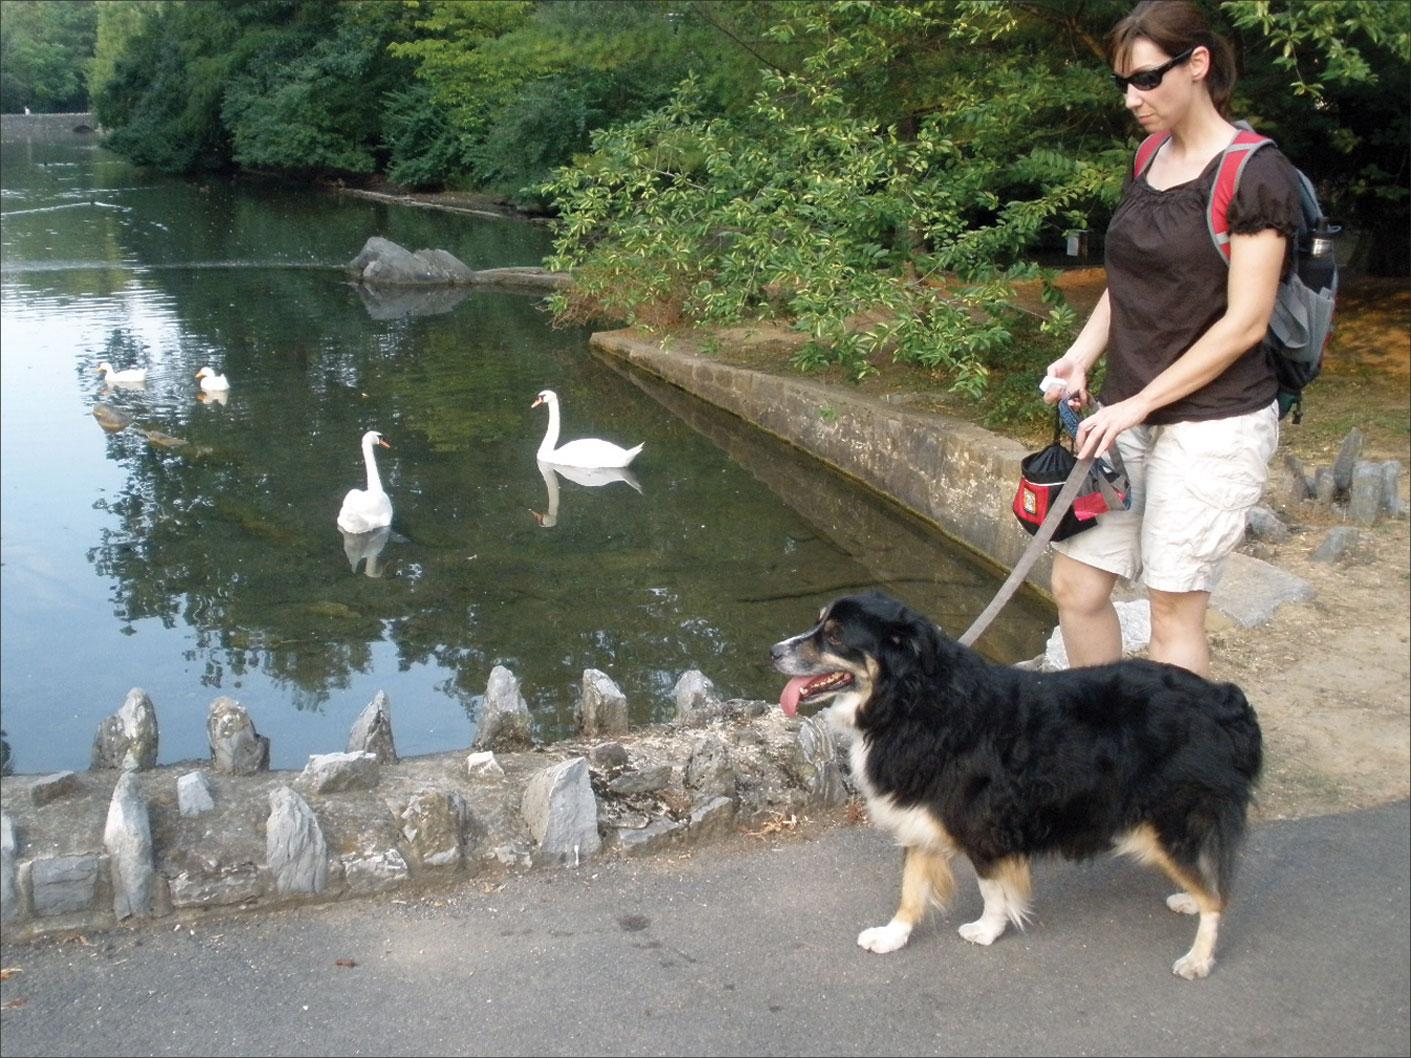 training dog to respect ducks